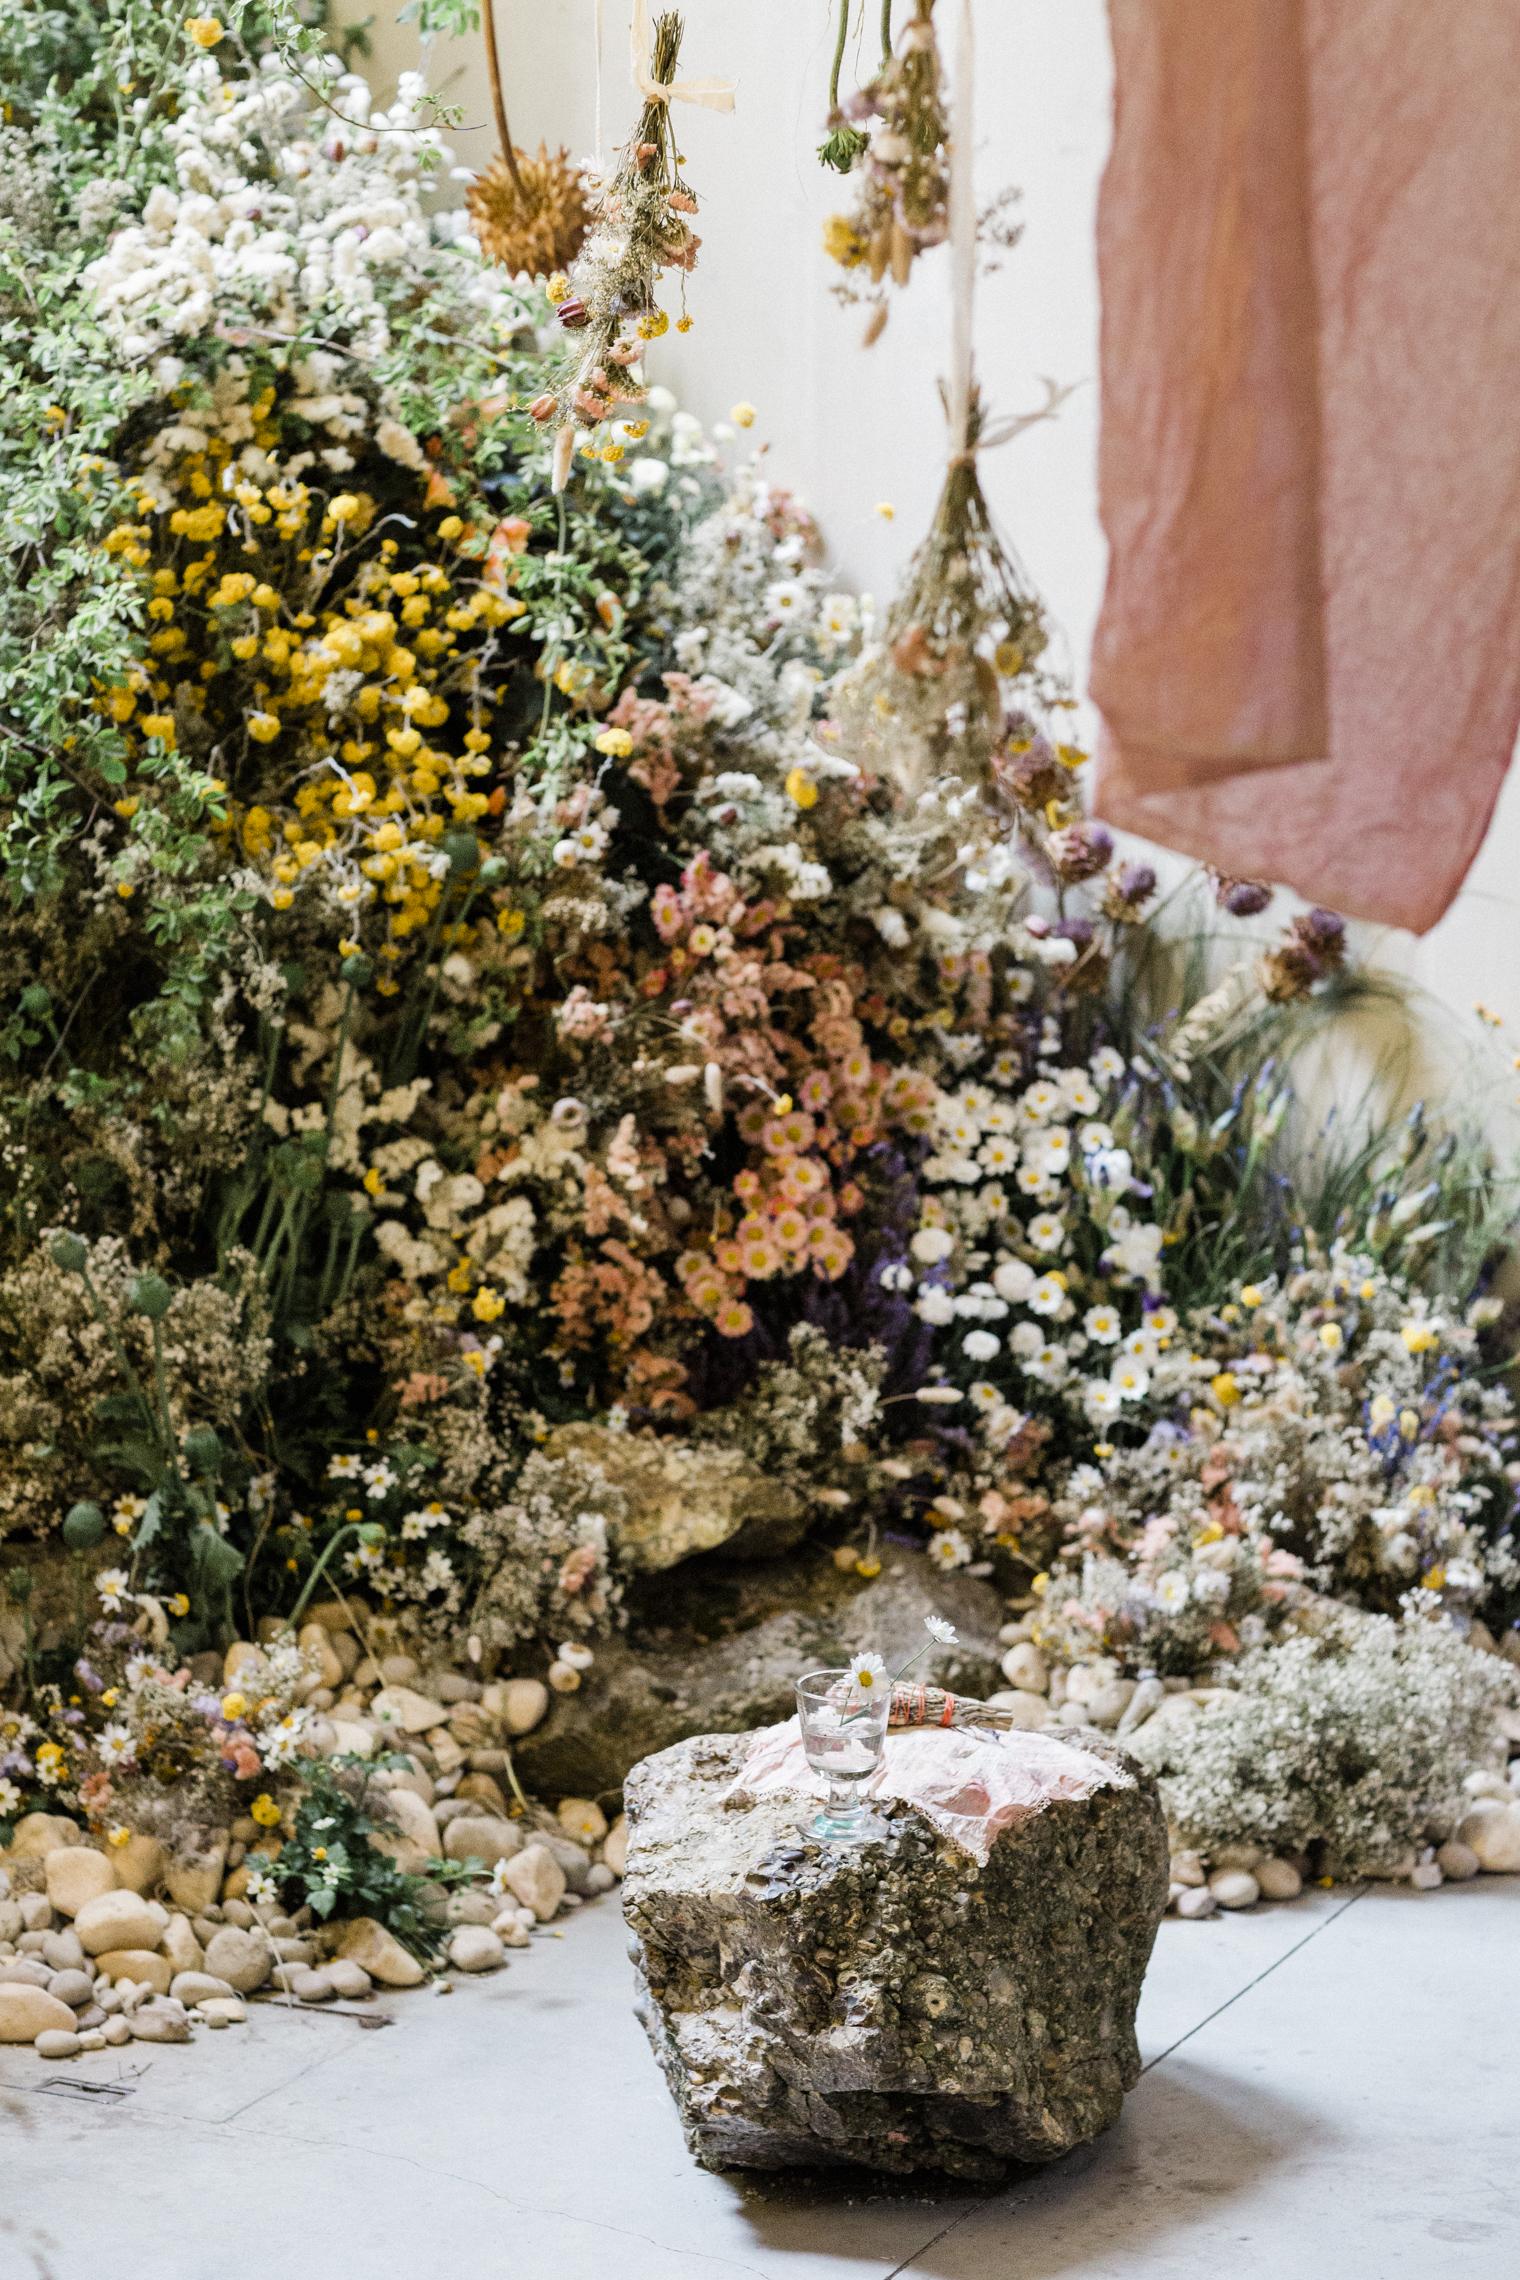 Worm Installation at the Garden Museum